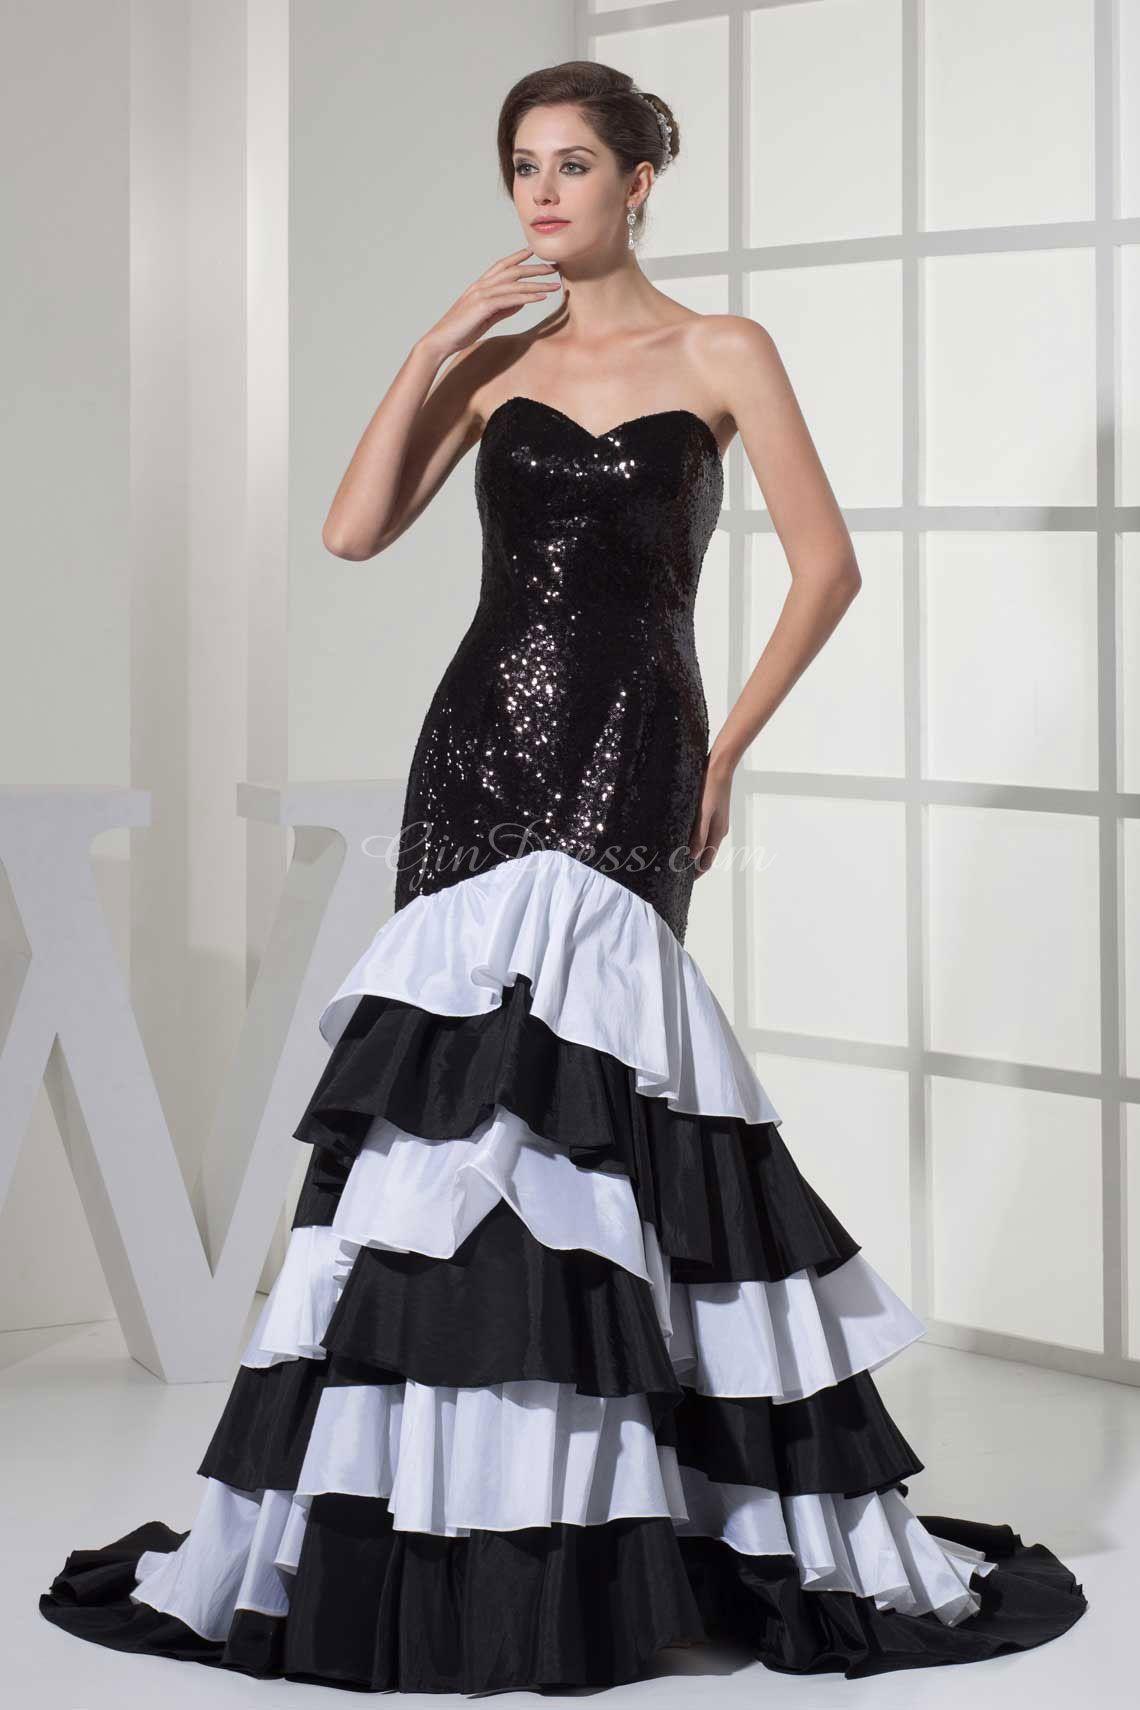 Prom dress prom dresses style pinterest dress prom prom and